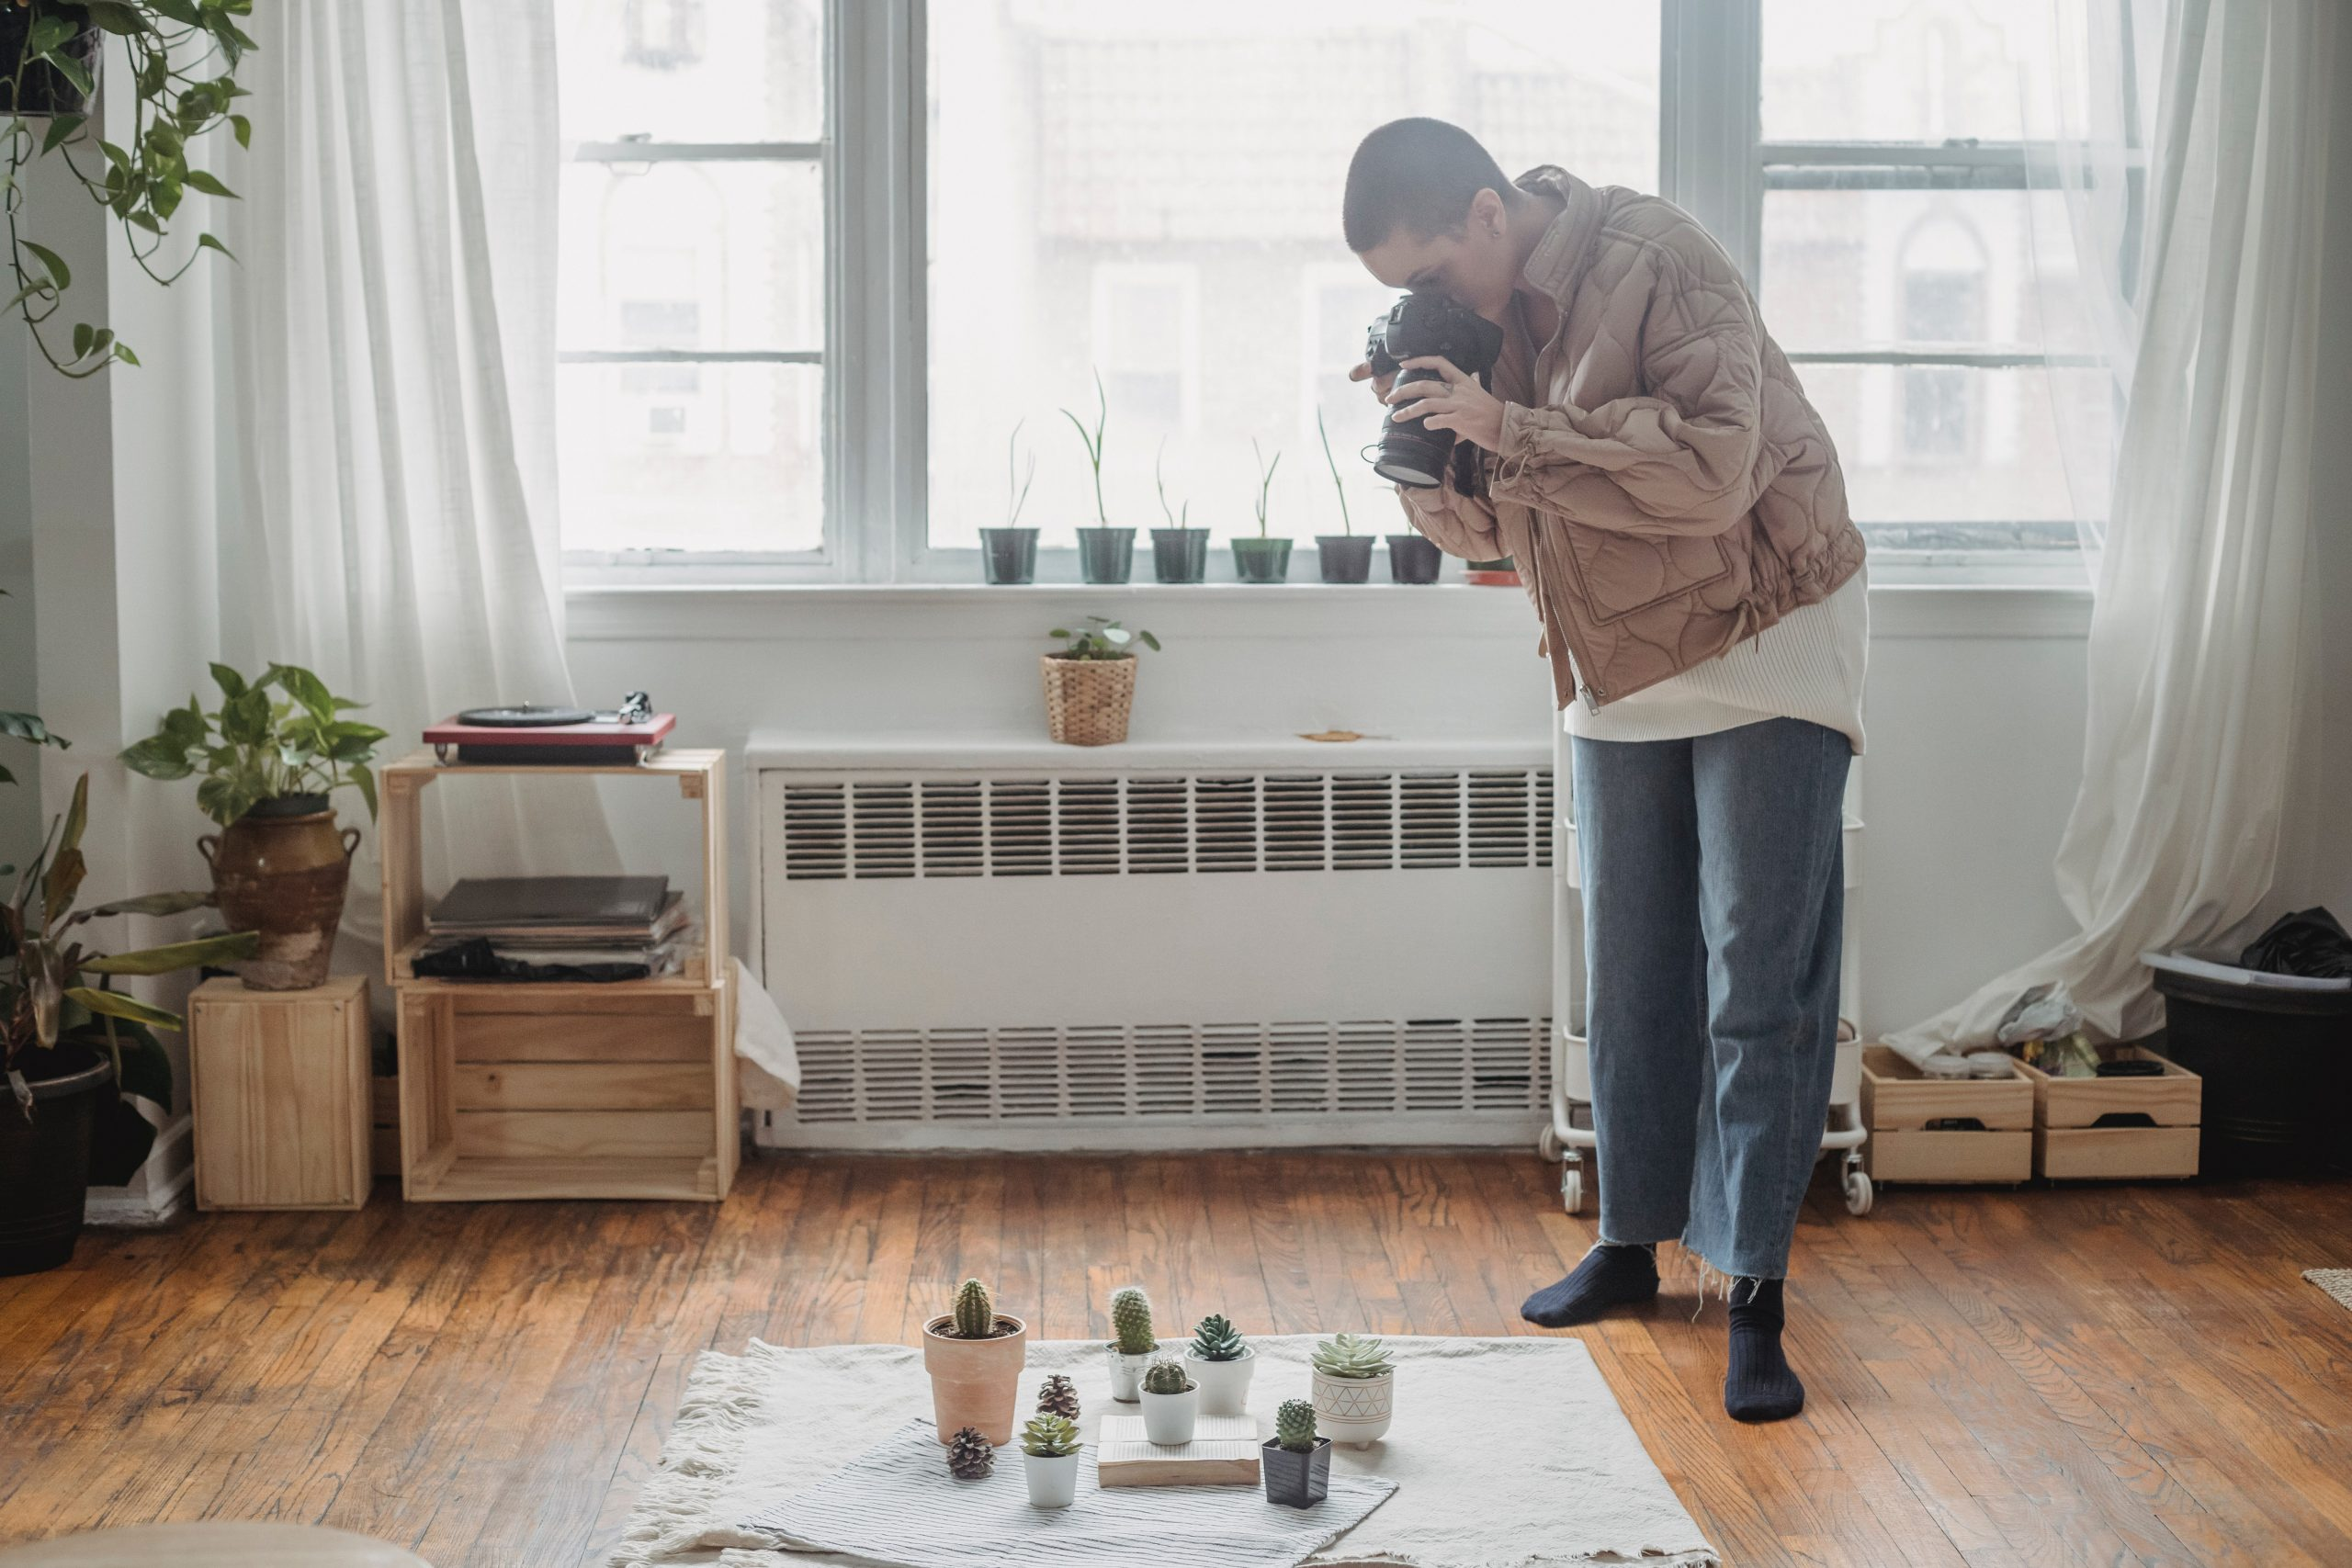 Photography hacks by Slazzer